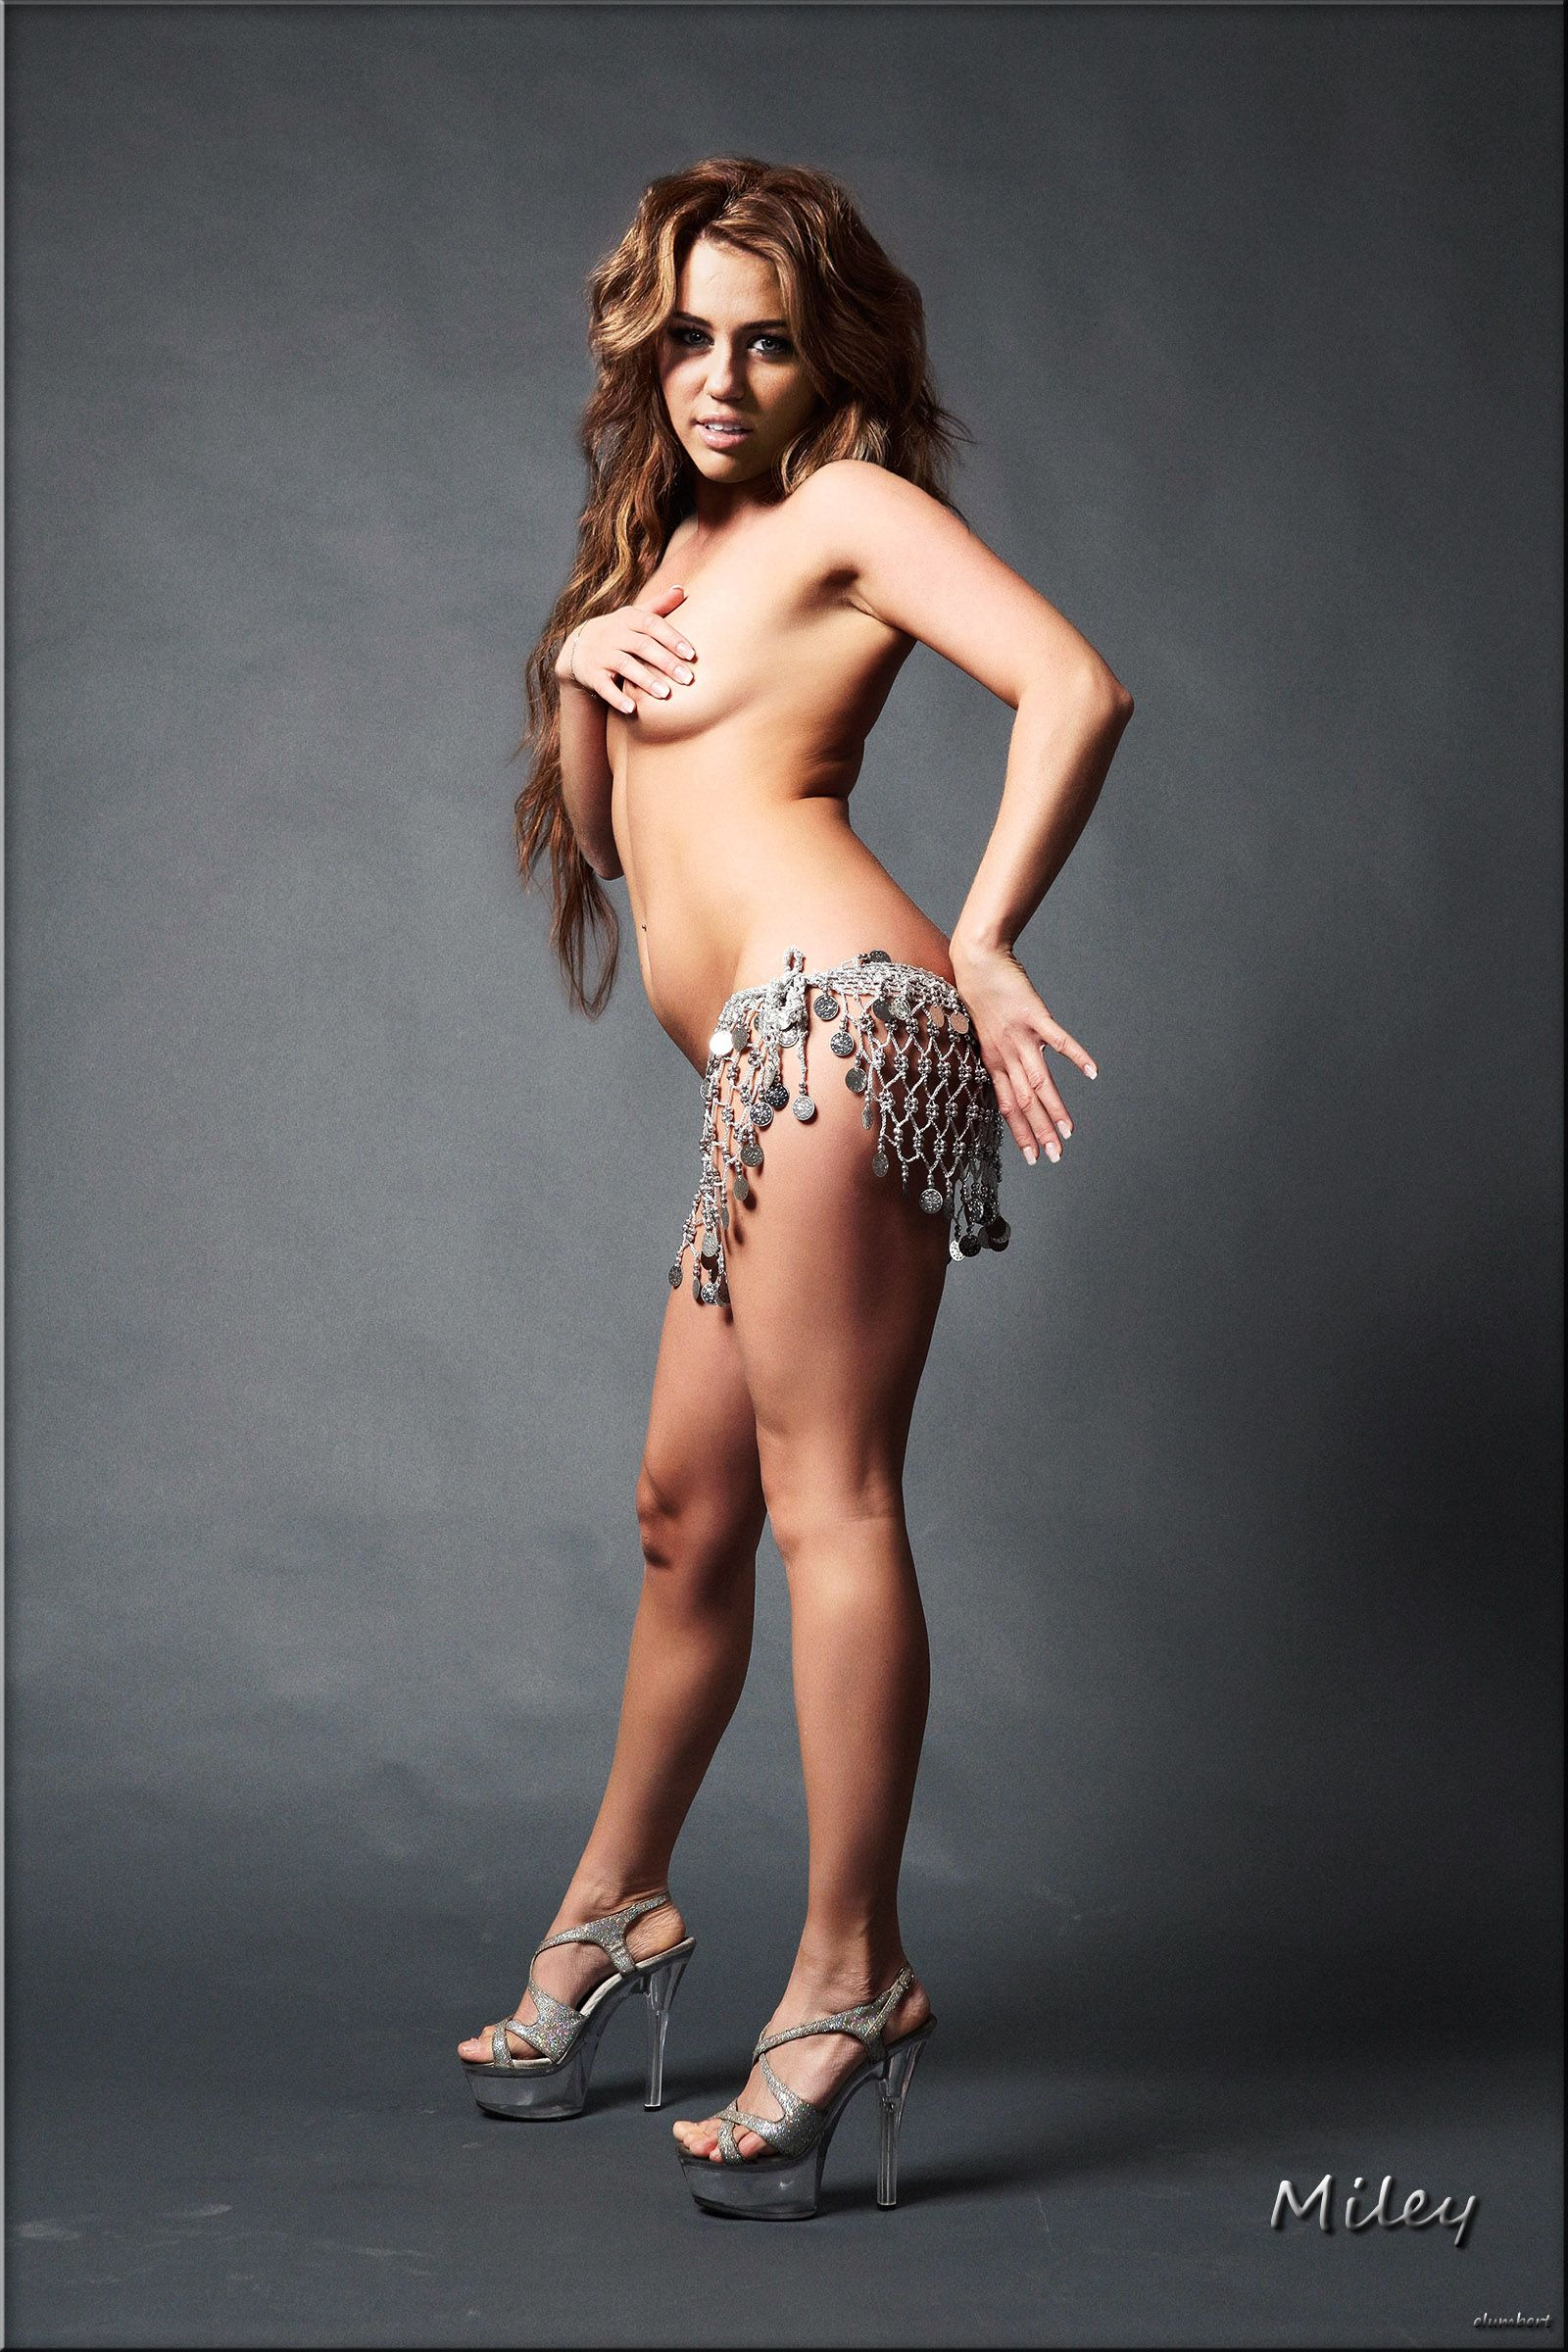 Topless Bellydancer Miley Cyrus Girls Pinterest Miley Cyrus